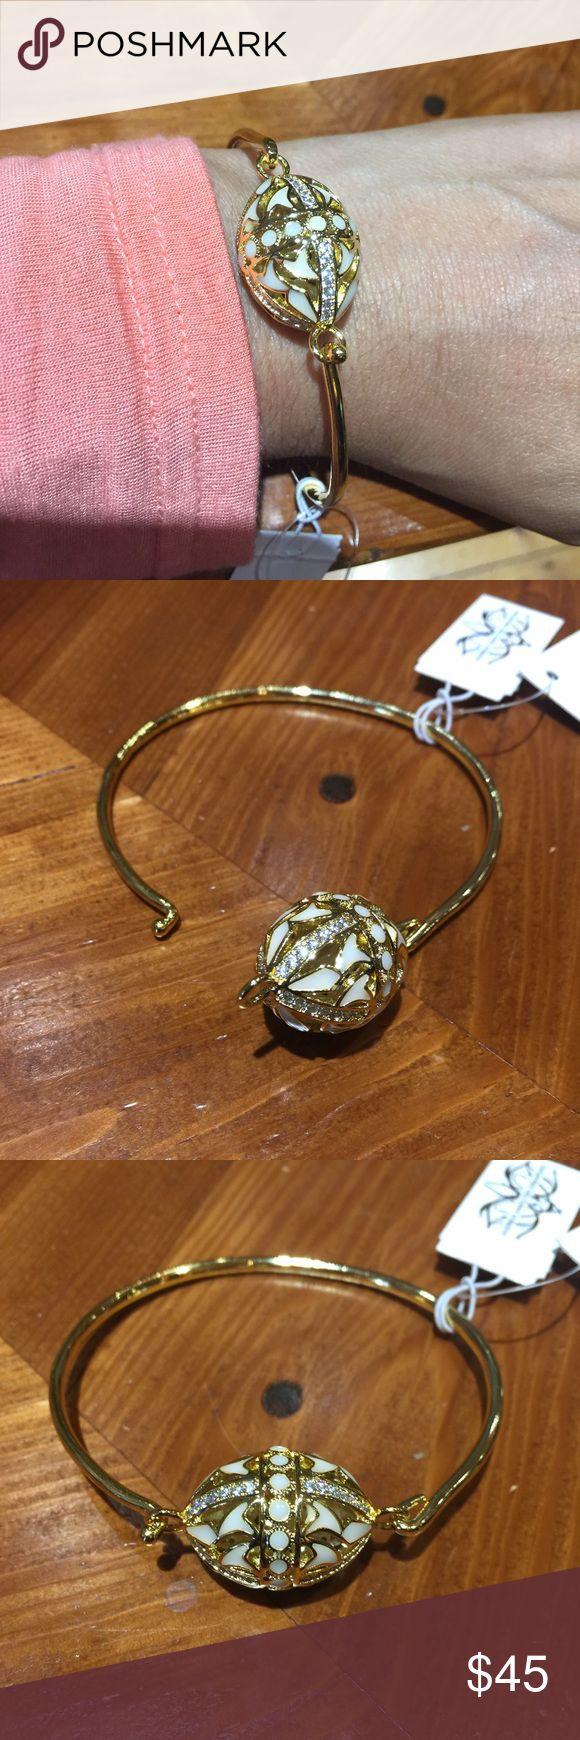 Amazing AHC Bracelet AHC Rondellette High Wire Gold & White Bracelet Anthony Hamilton Crawford  Jewelry Bracelets